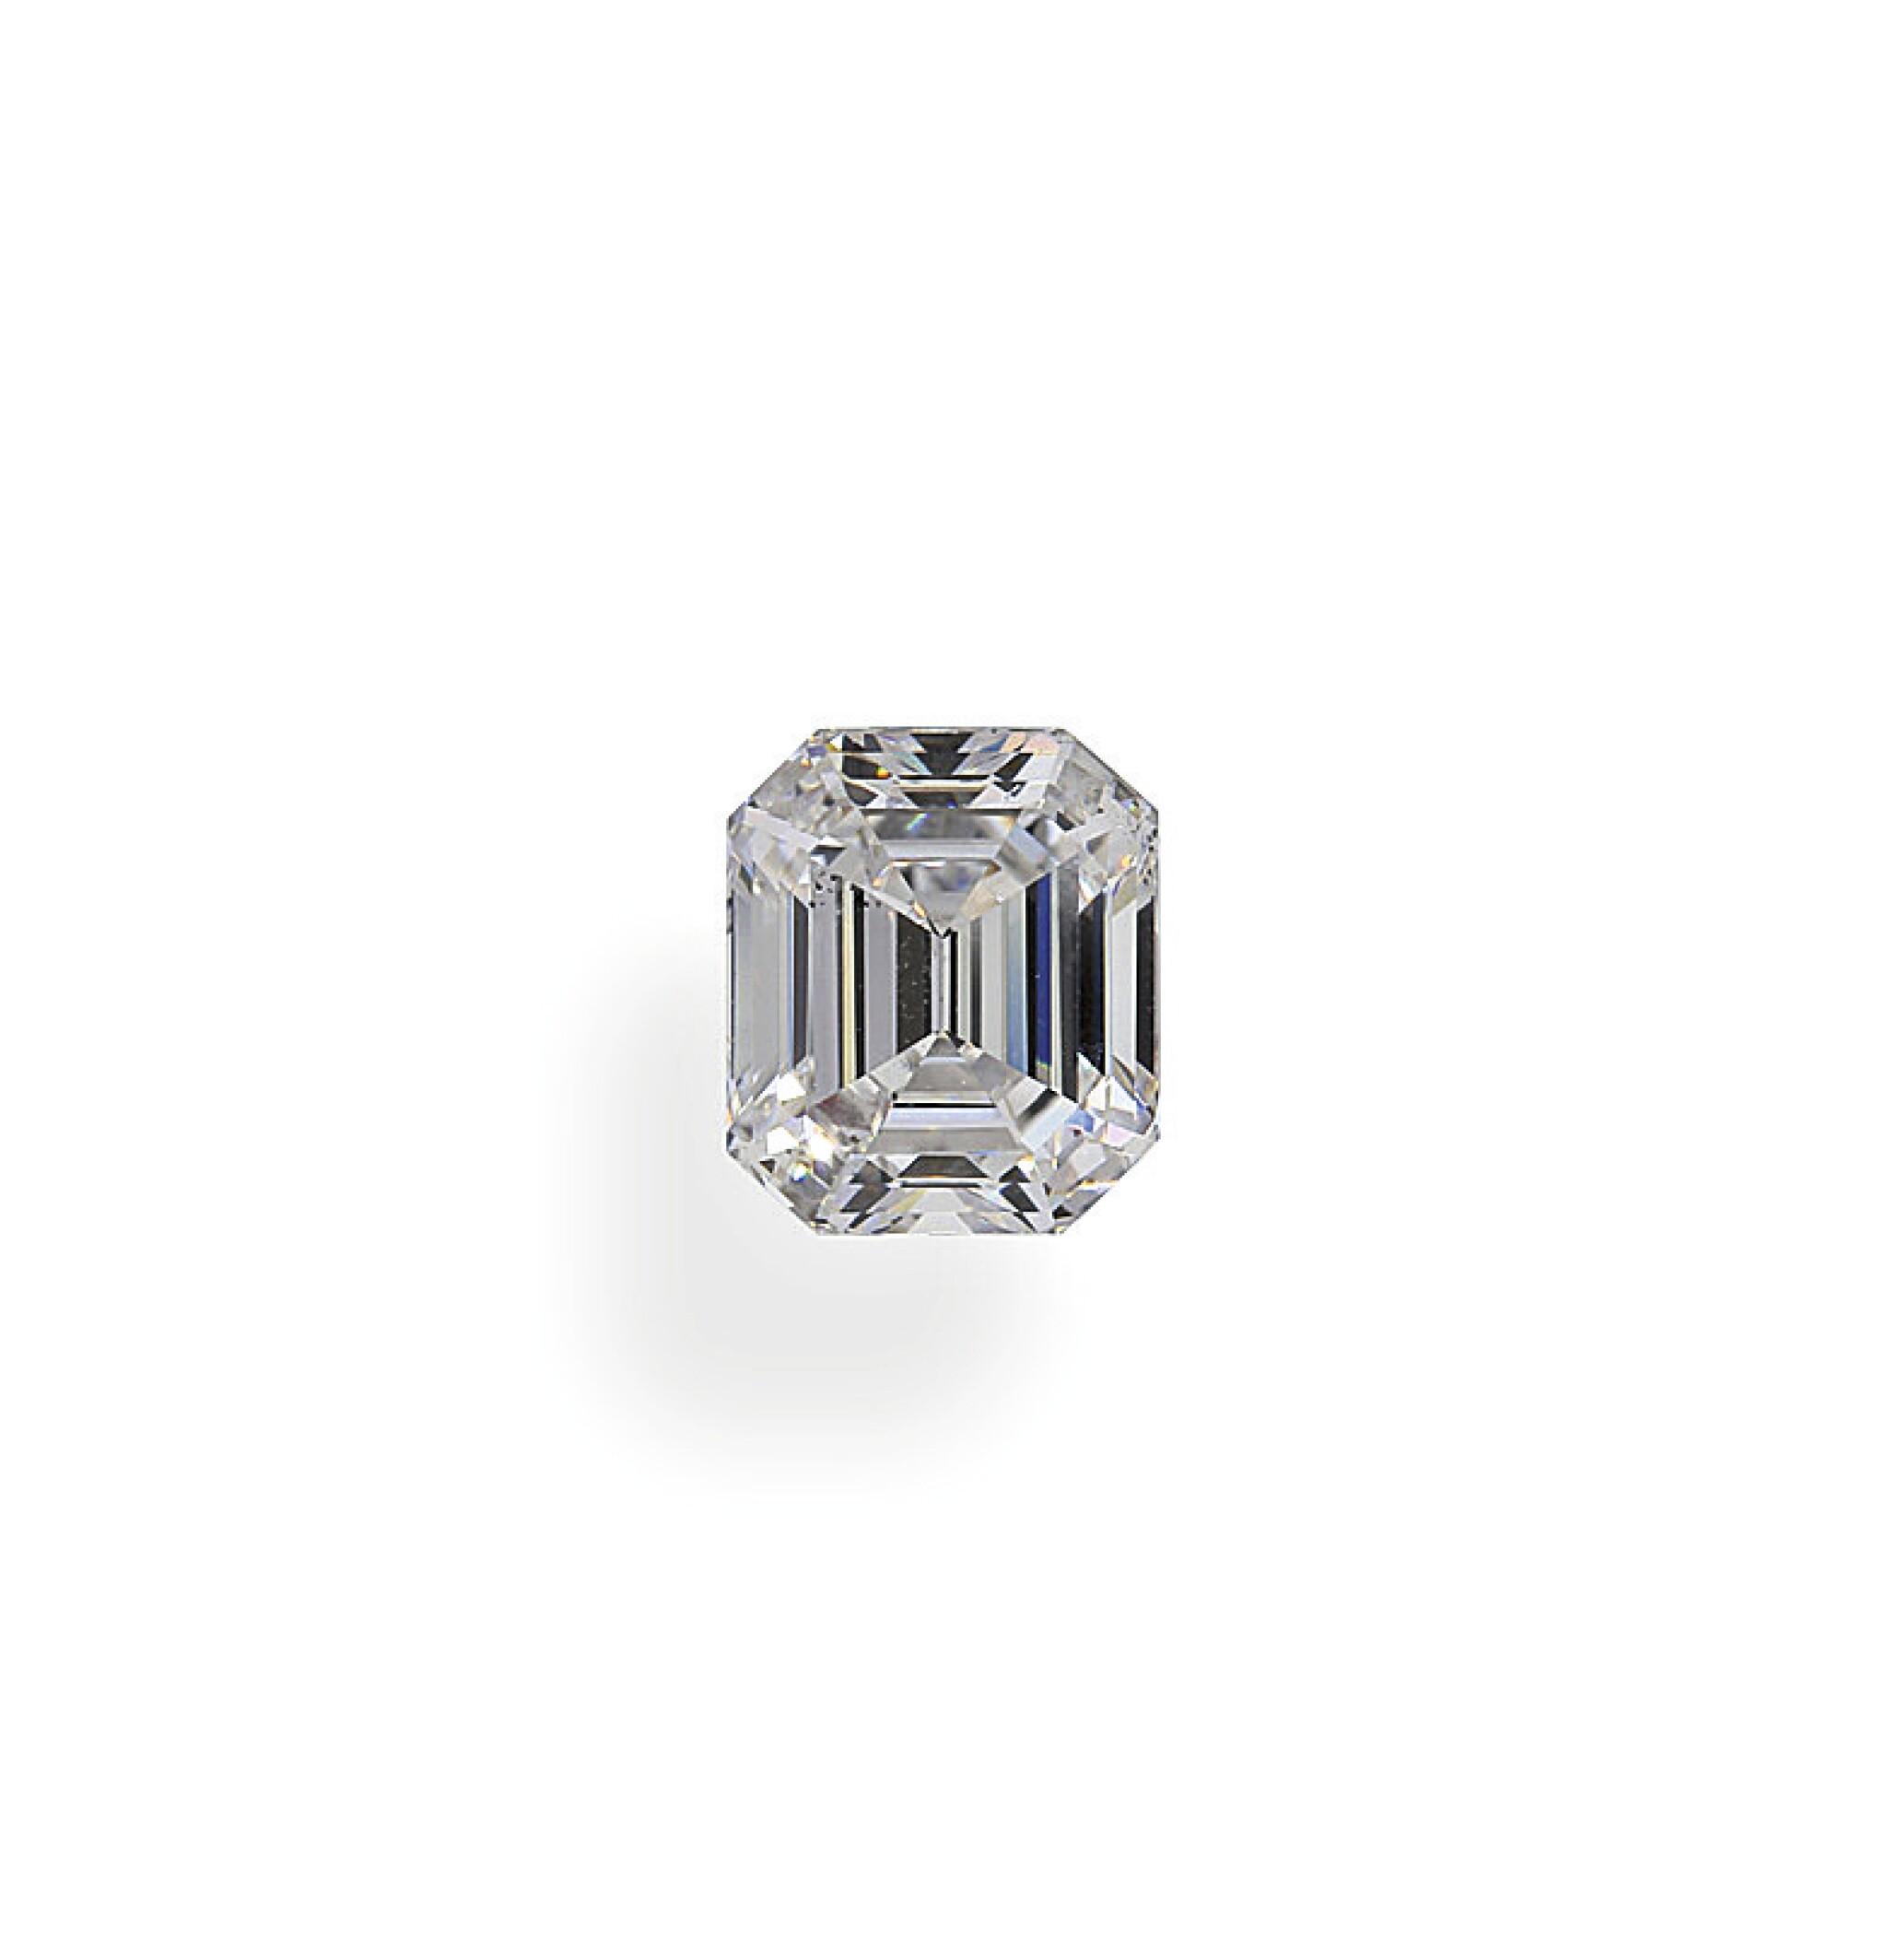 View full screen - View 1 of Lot 18. A 1.12 Carat Emerald-Cut Diamond, D Color, SI1 Clarity.